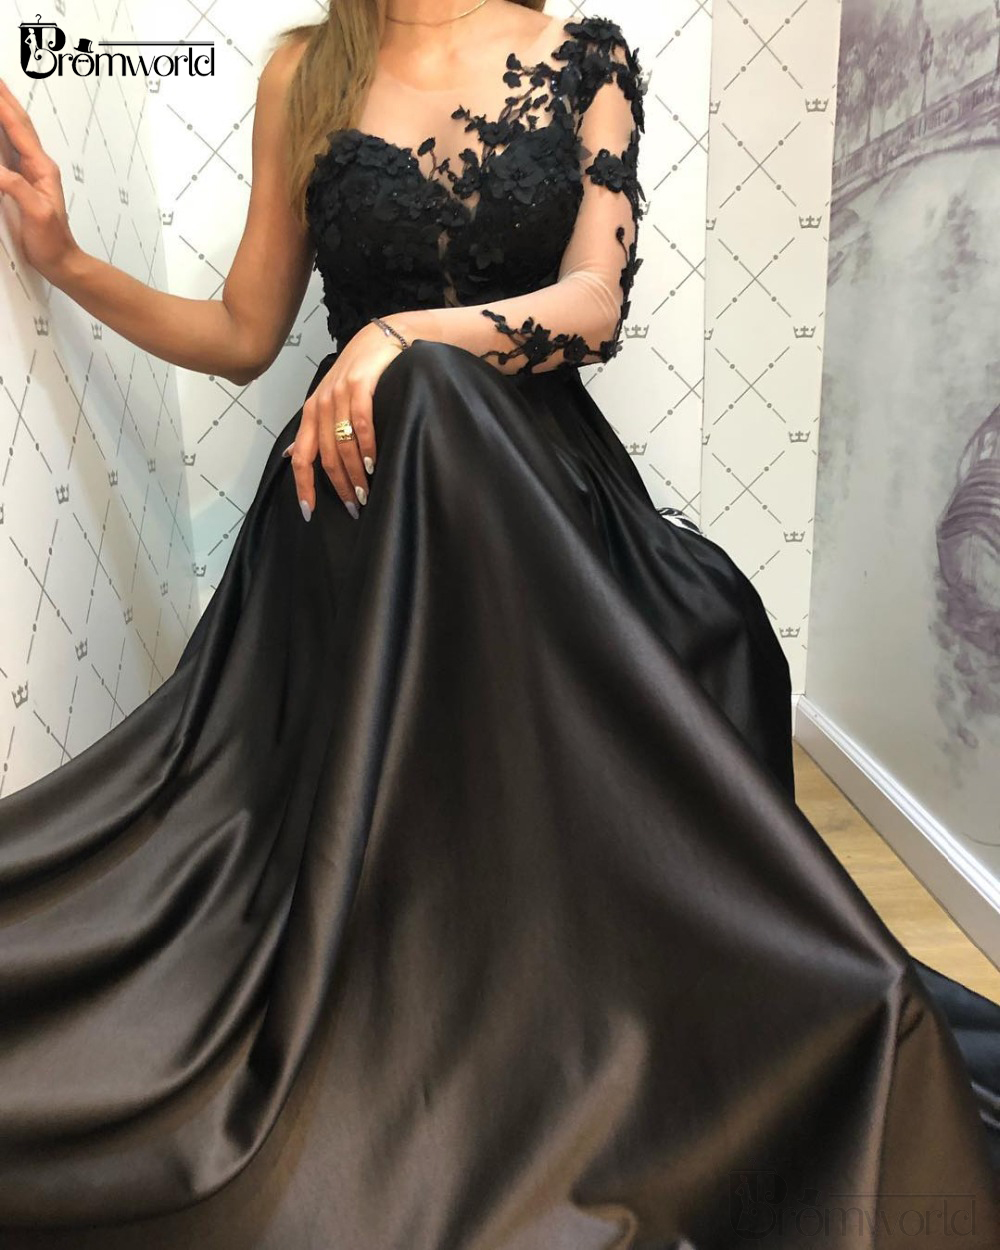 One Shoulder Long Sleeve Black Evening Gowns for Women Robe De Soiree Flowers A-Line Satin Elegant Formal Dresses Plus Size